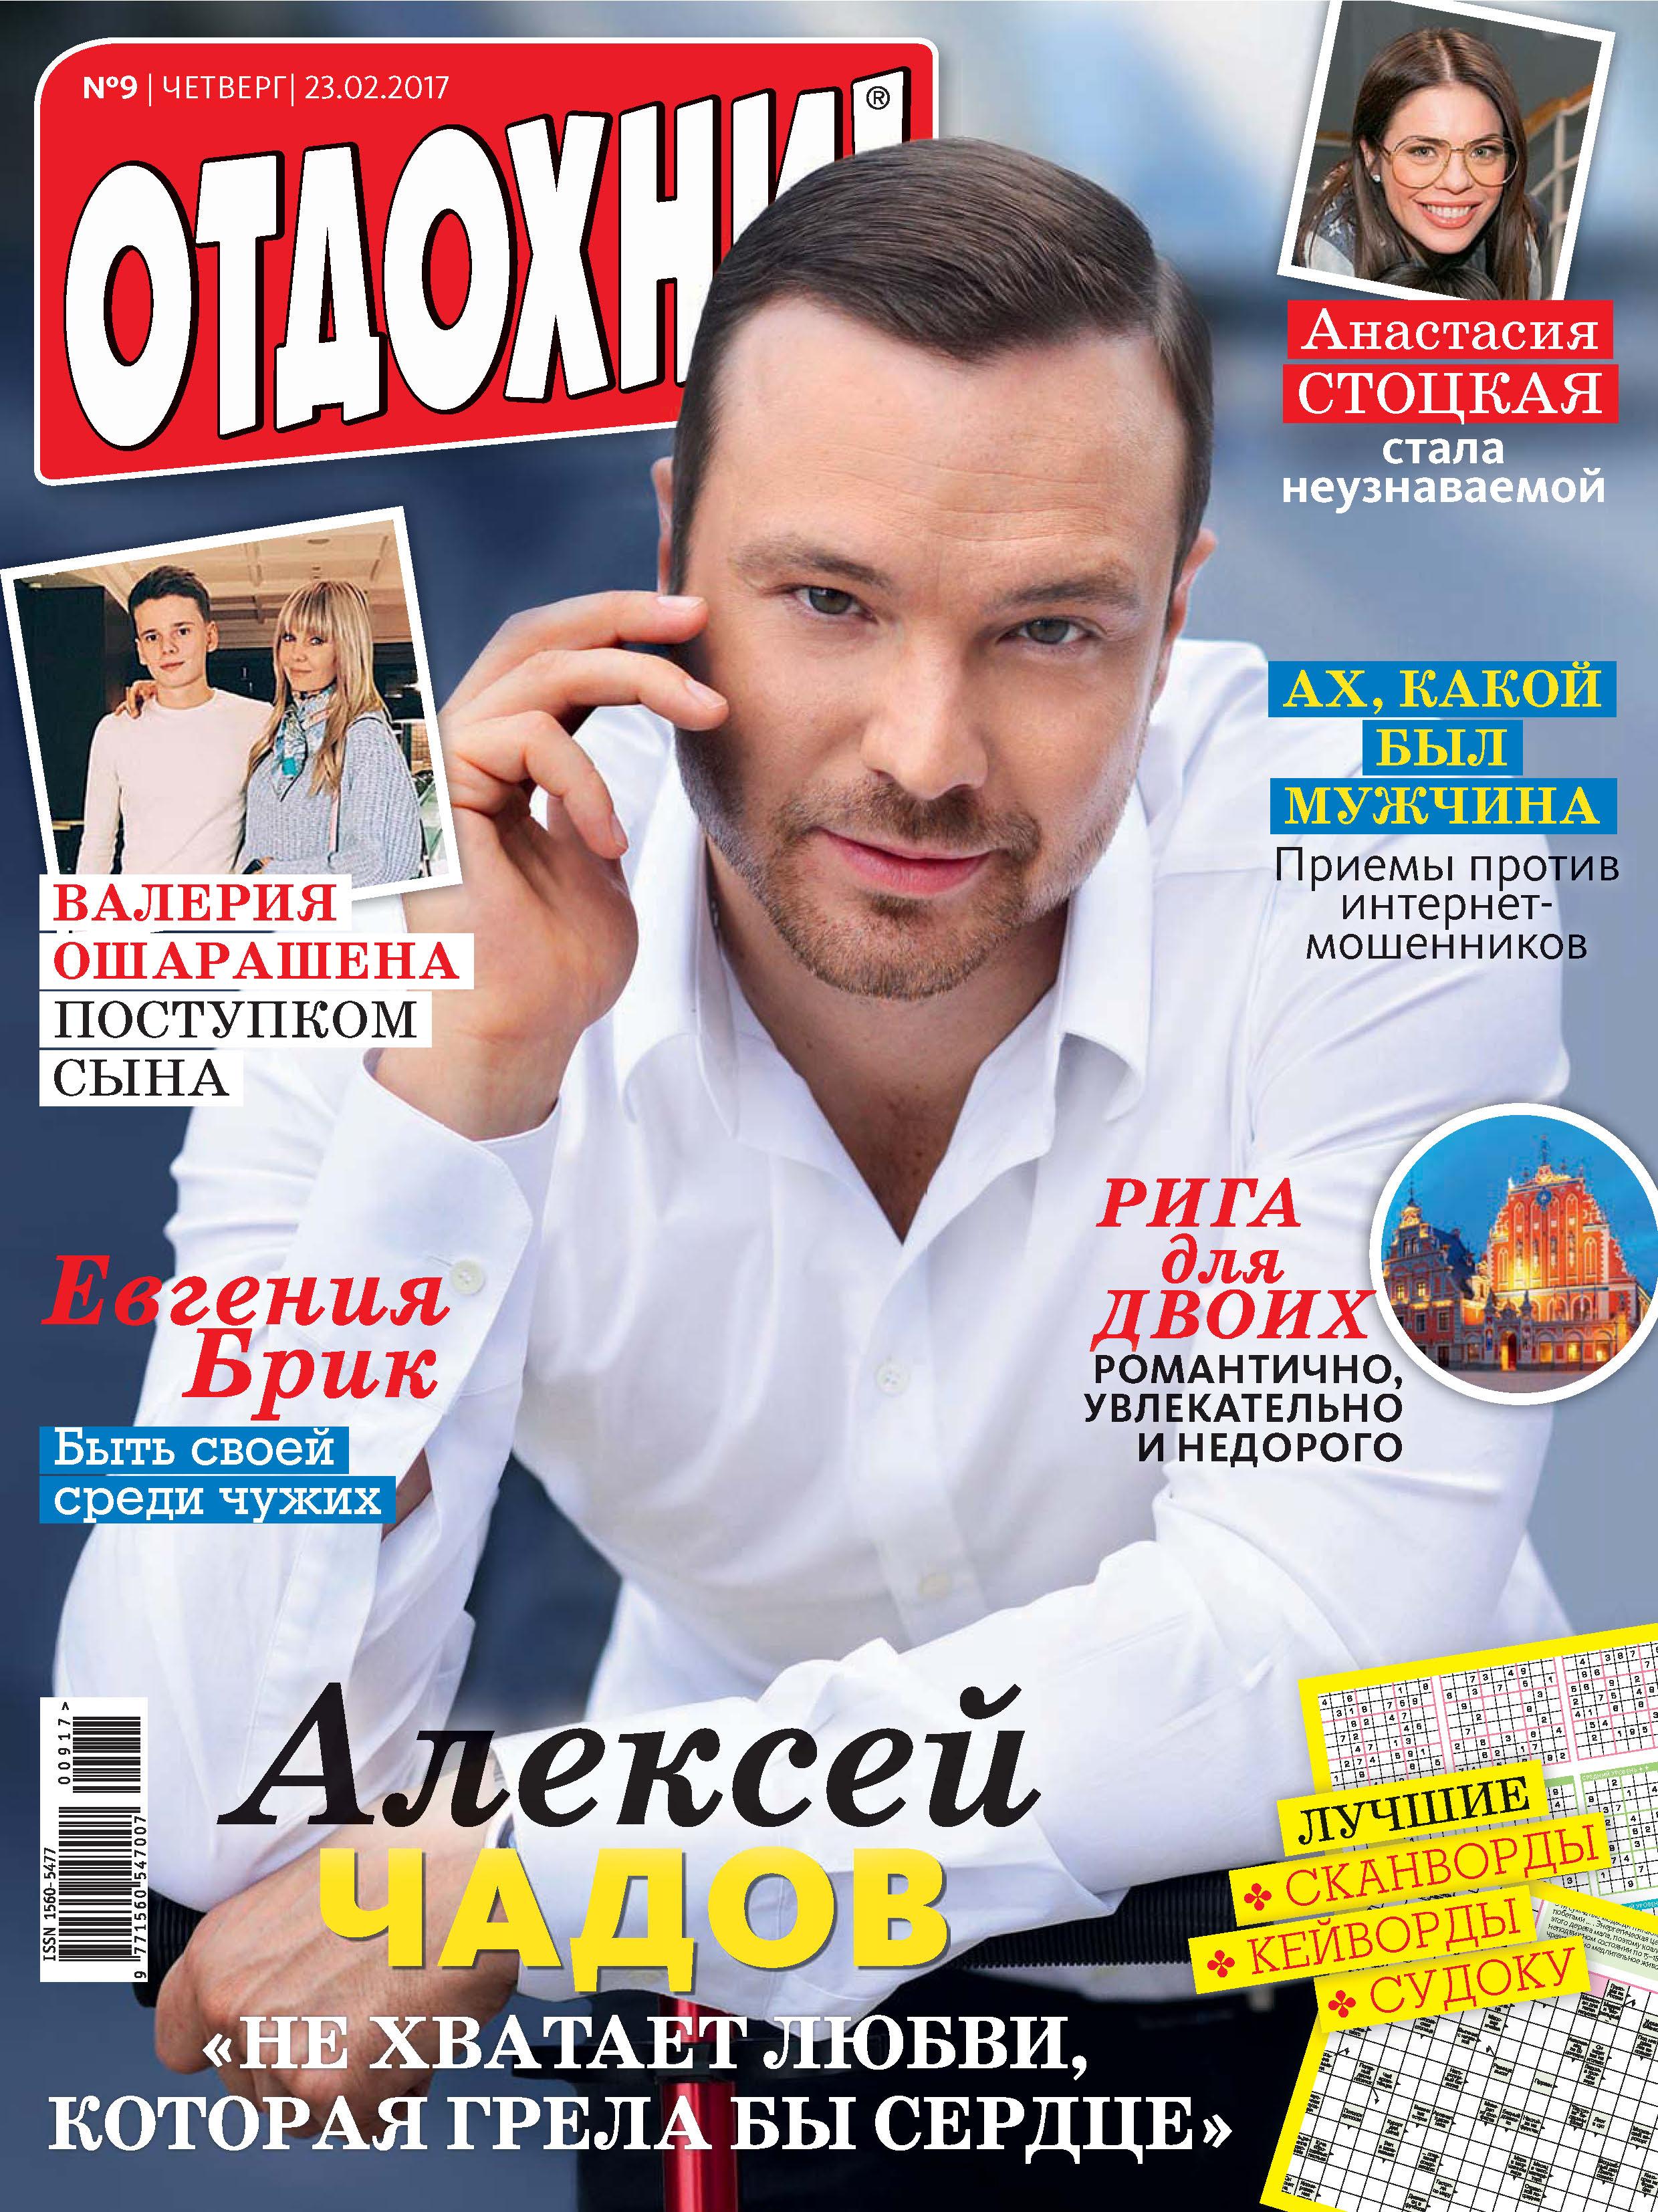 ИД «Бурда» Журнал «Отдохни!» №09/2017 ид бурда журнал отдохни 12 2017